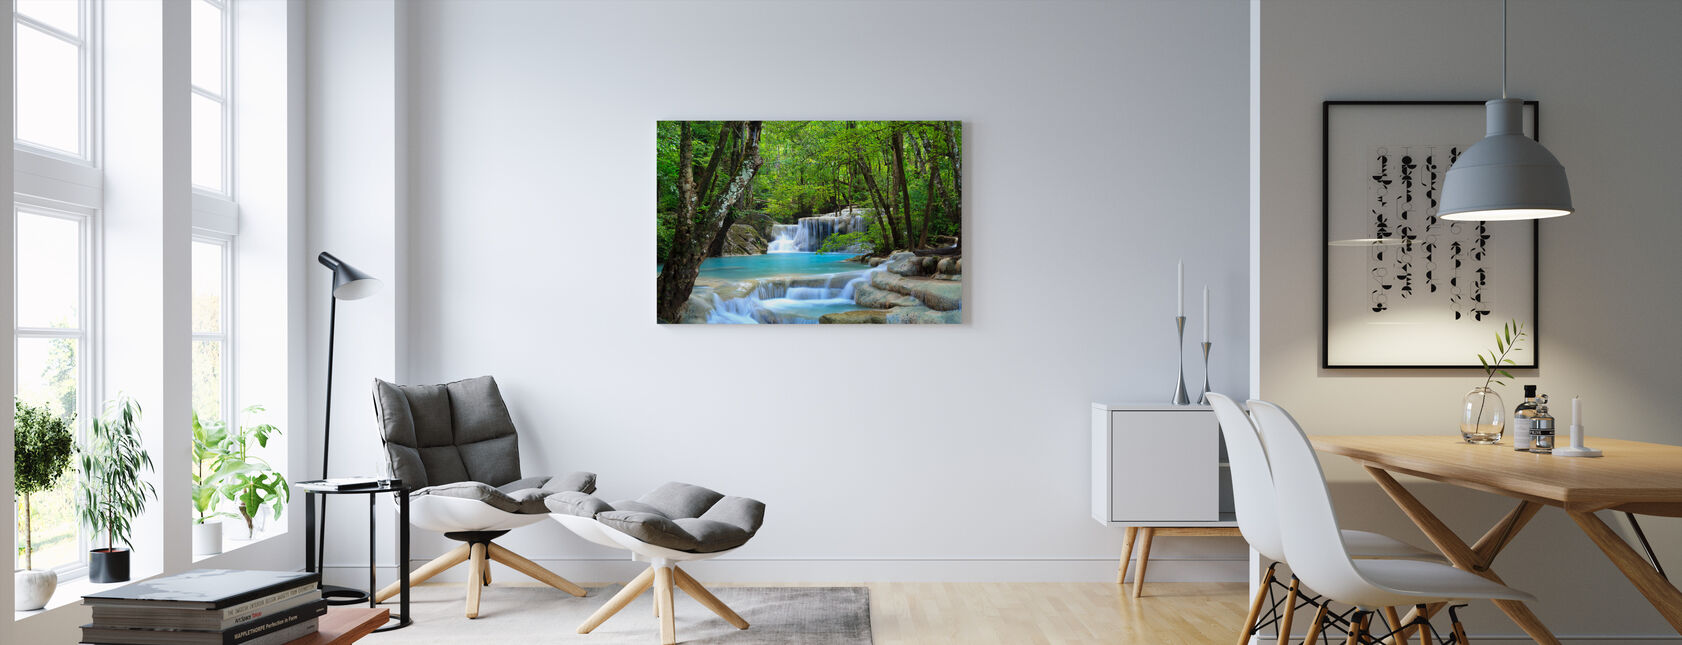 Erawan vattenfall Thailand - Canvastavla - Vardagsrum